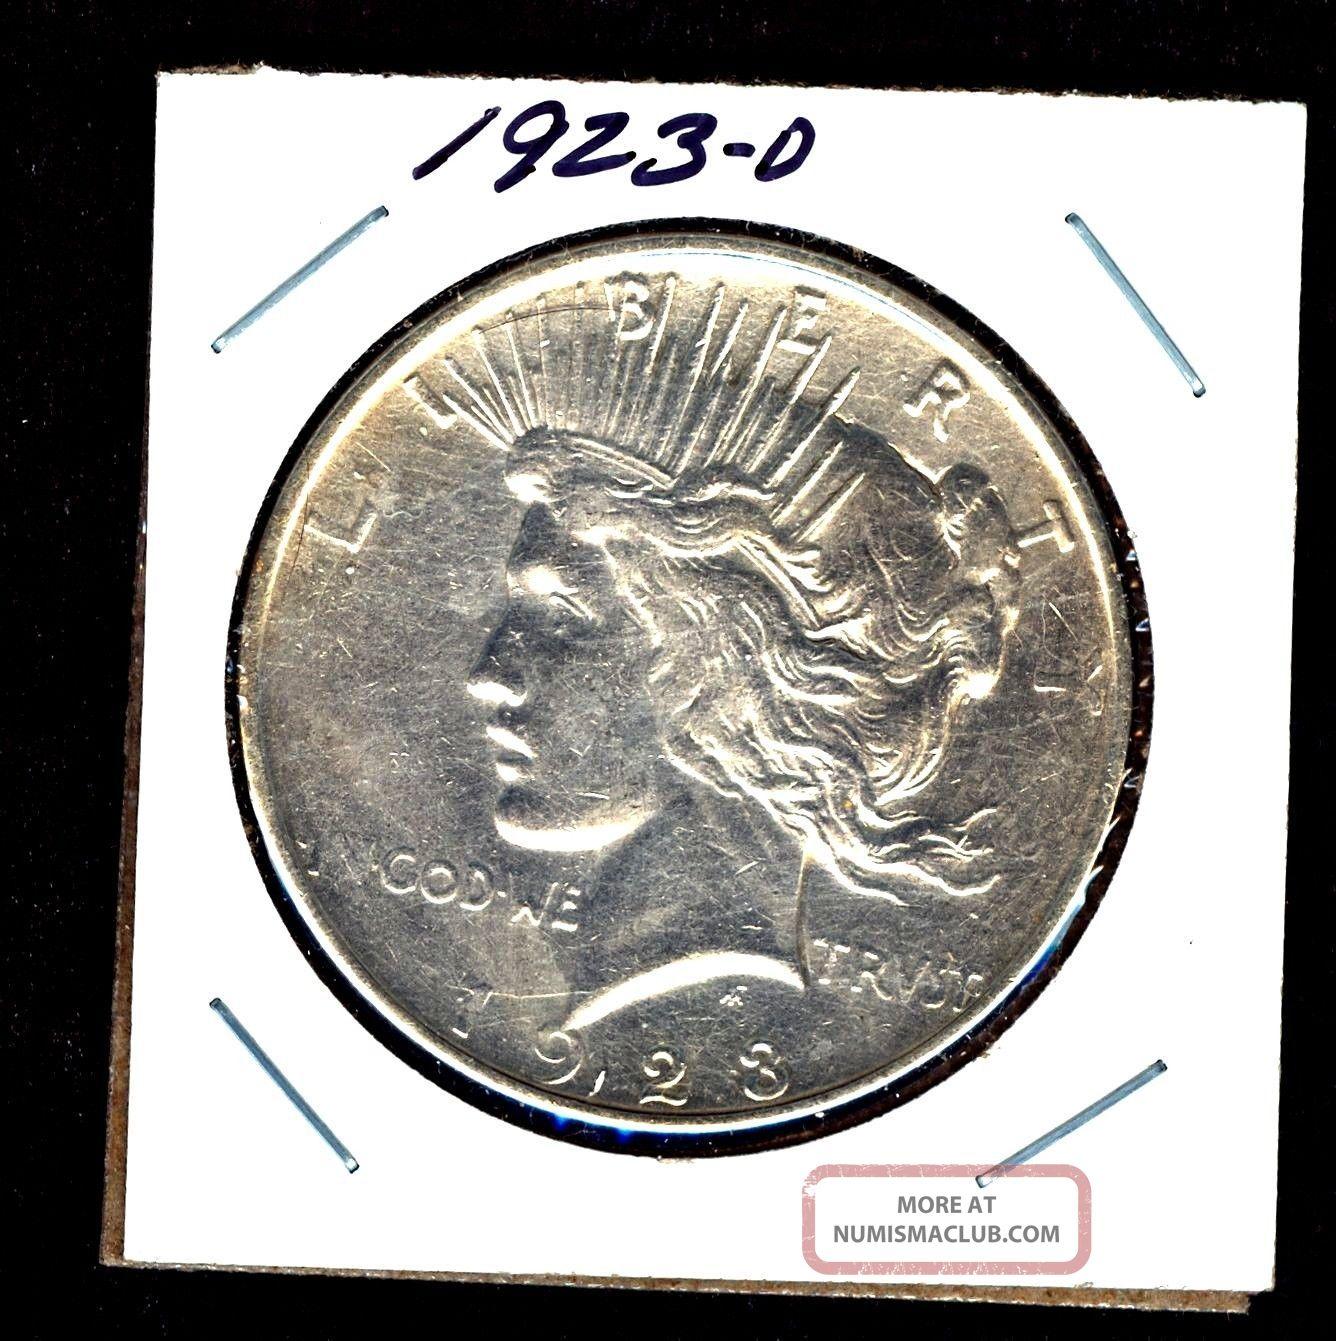 1923 D,  Unc Bu Denver 90 Silver Peace Dollar U S Coin 358631 Dollars photo